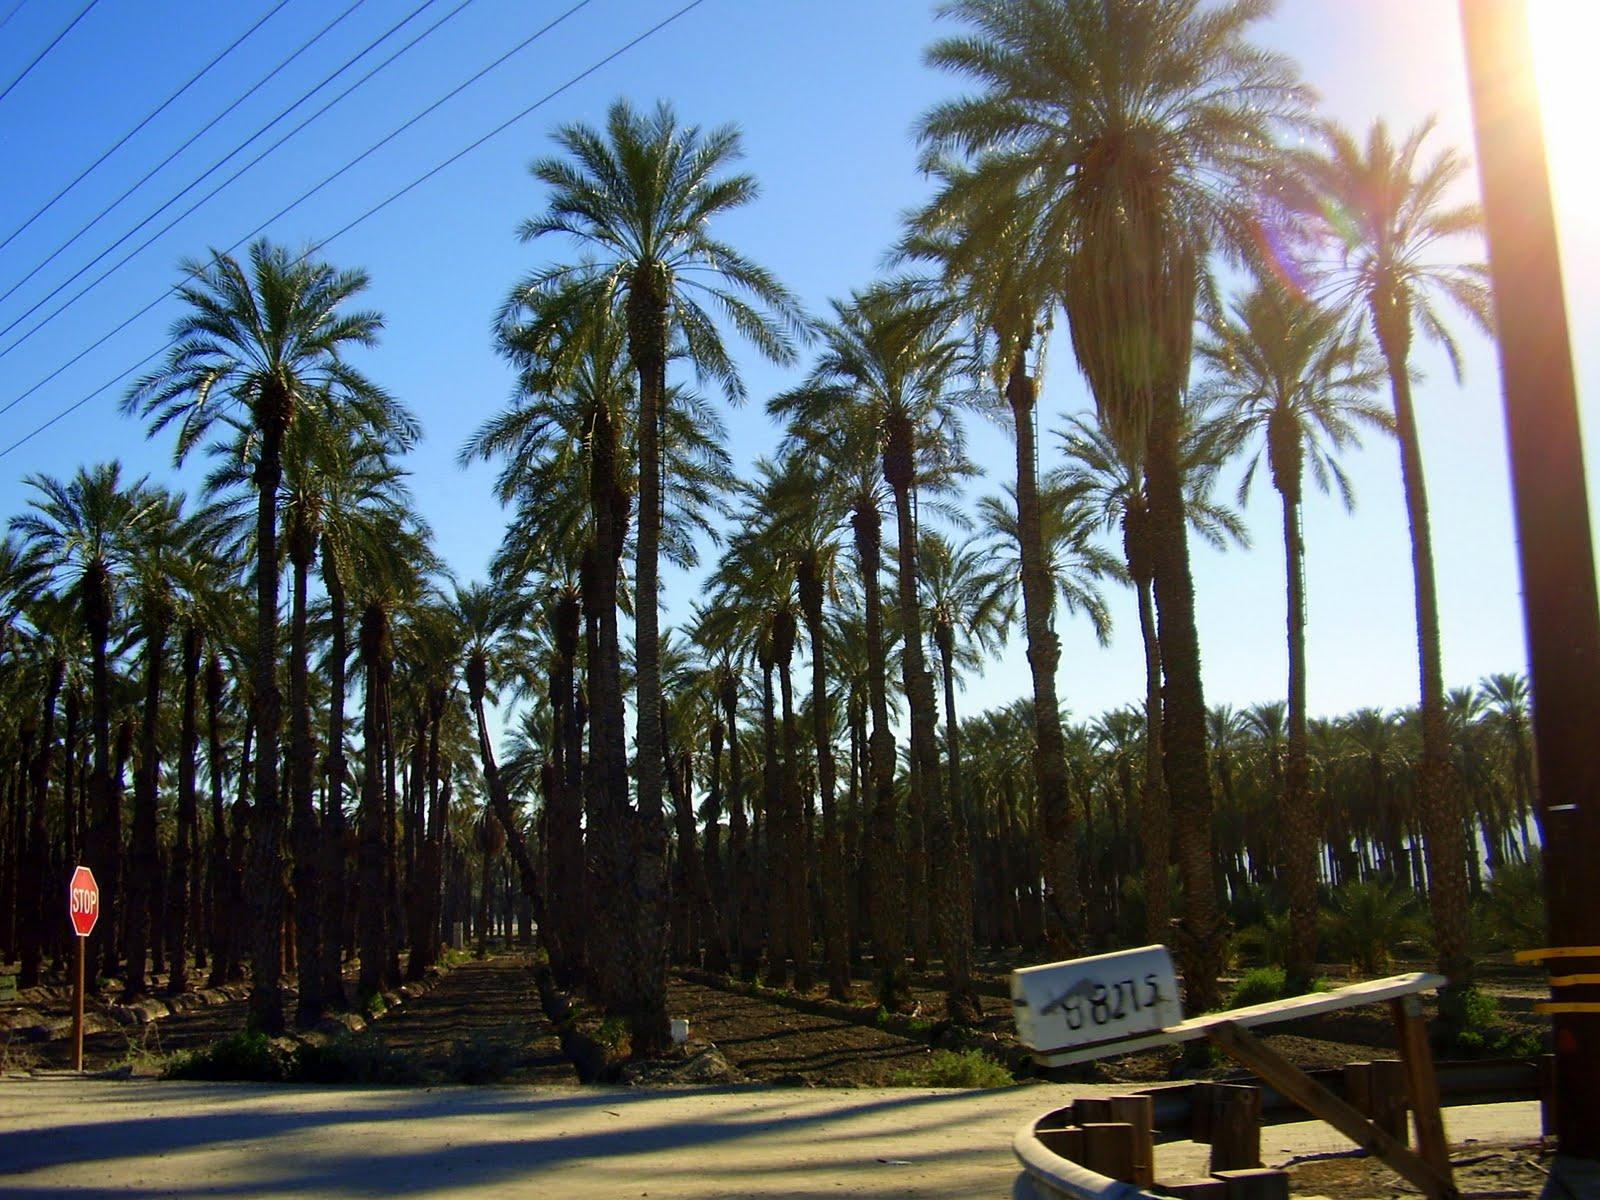 Jupiters Travels W Bmw Agua Caliente Palm Springs Via